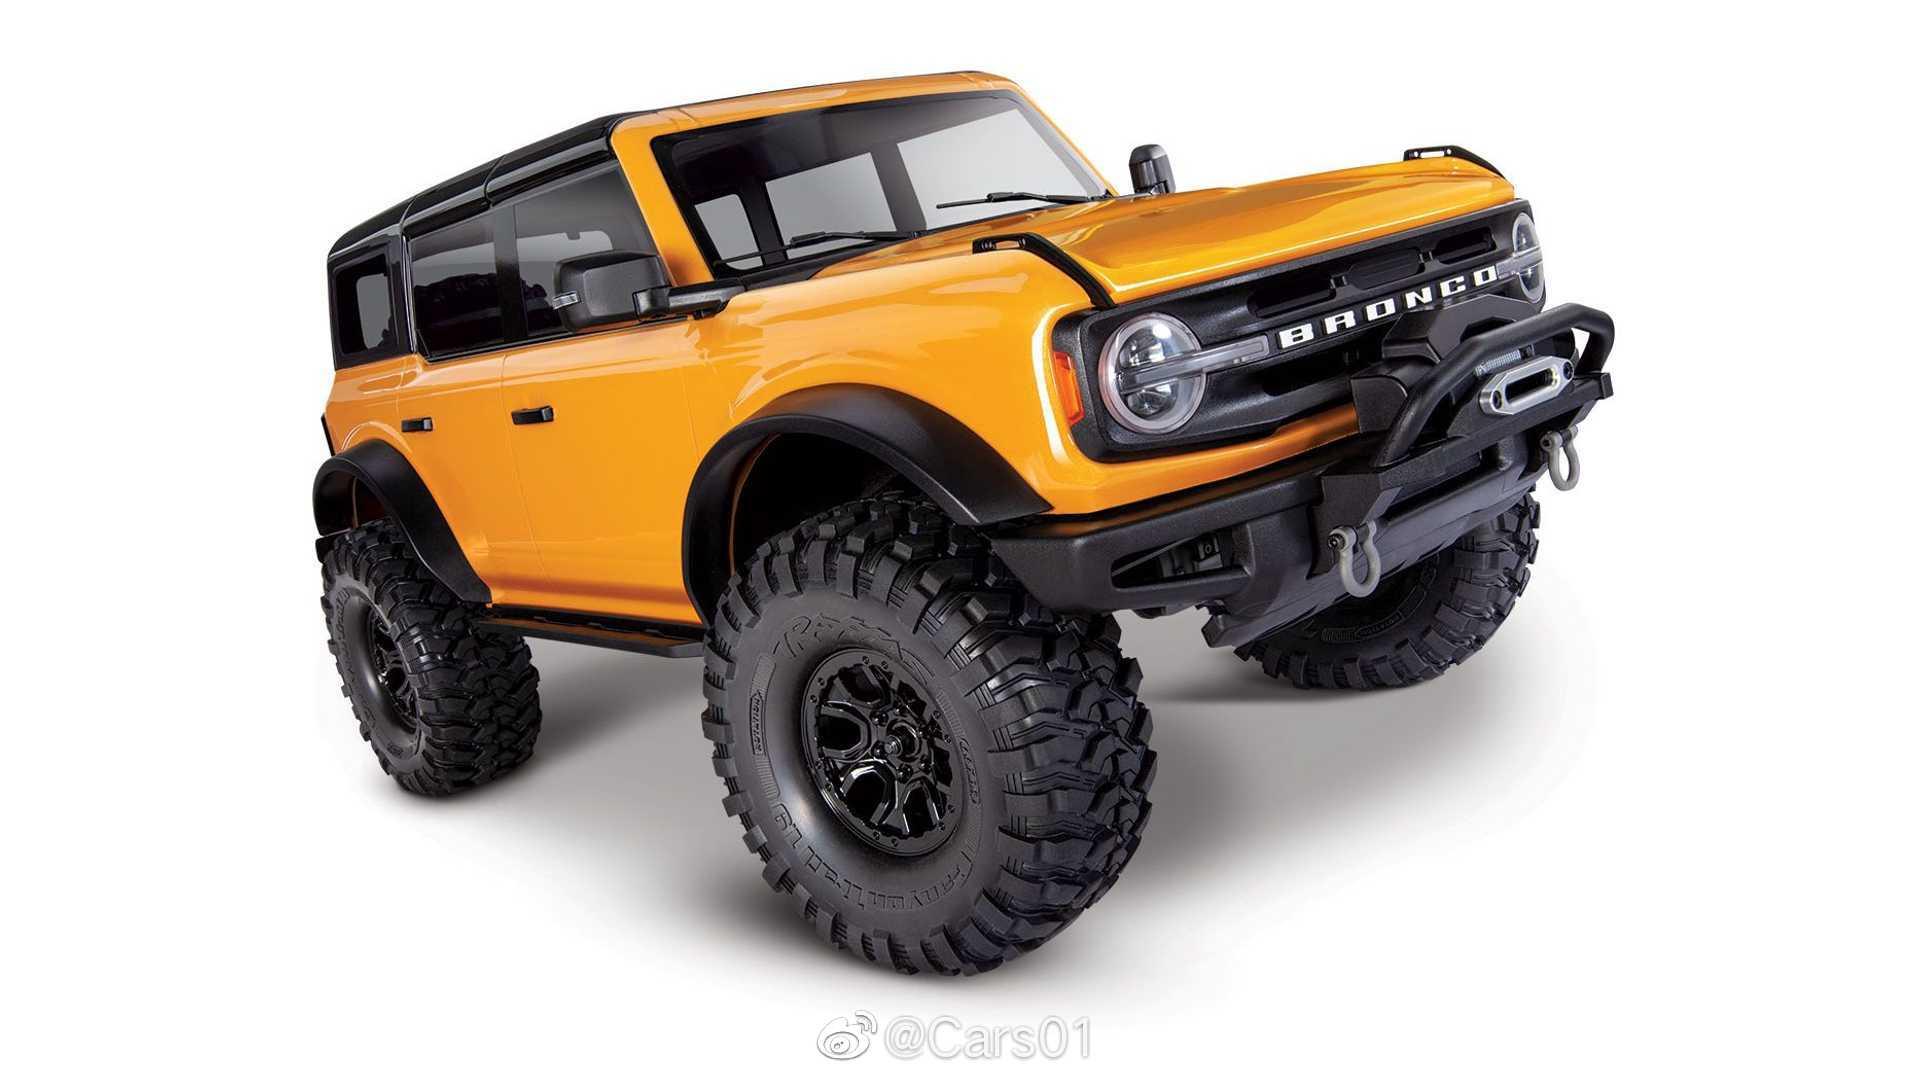 Traxxas推出1:10比例的全新福特Bronco遥控车……